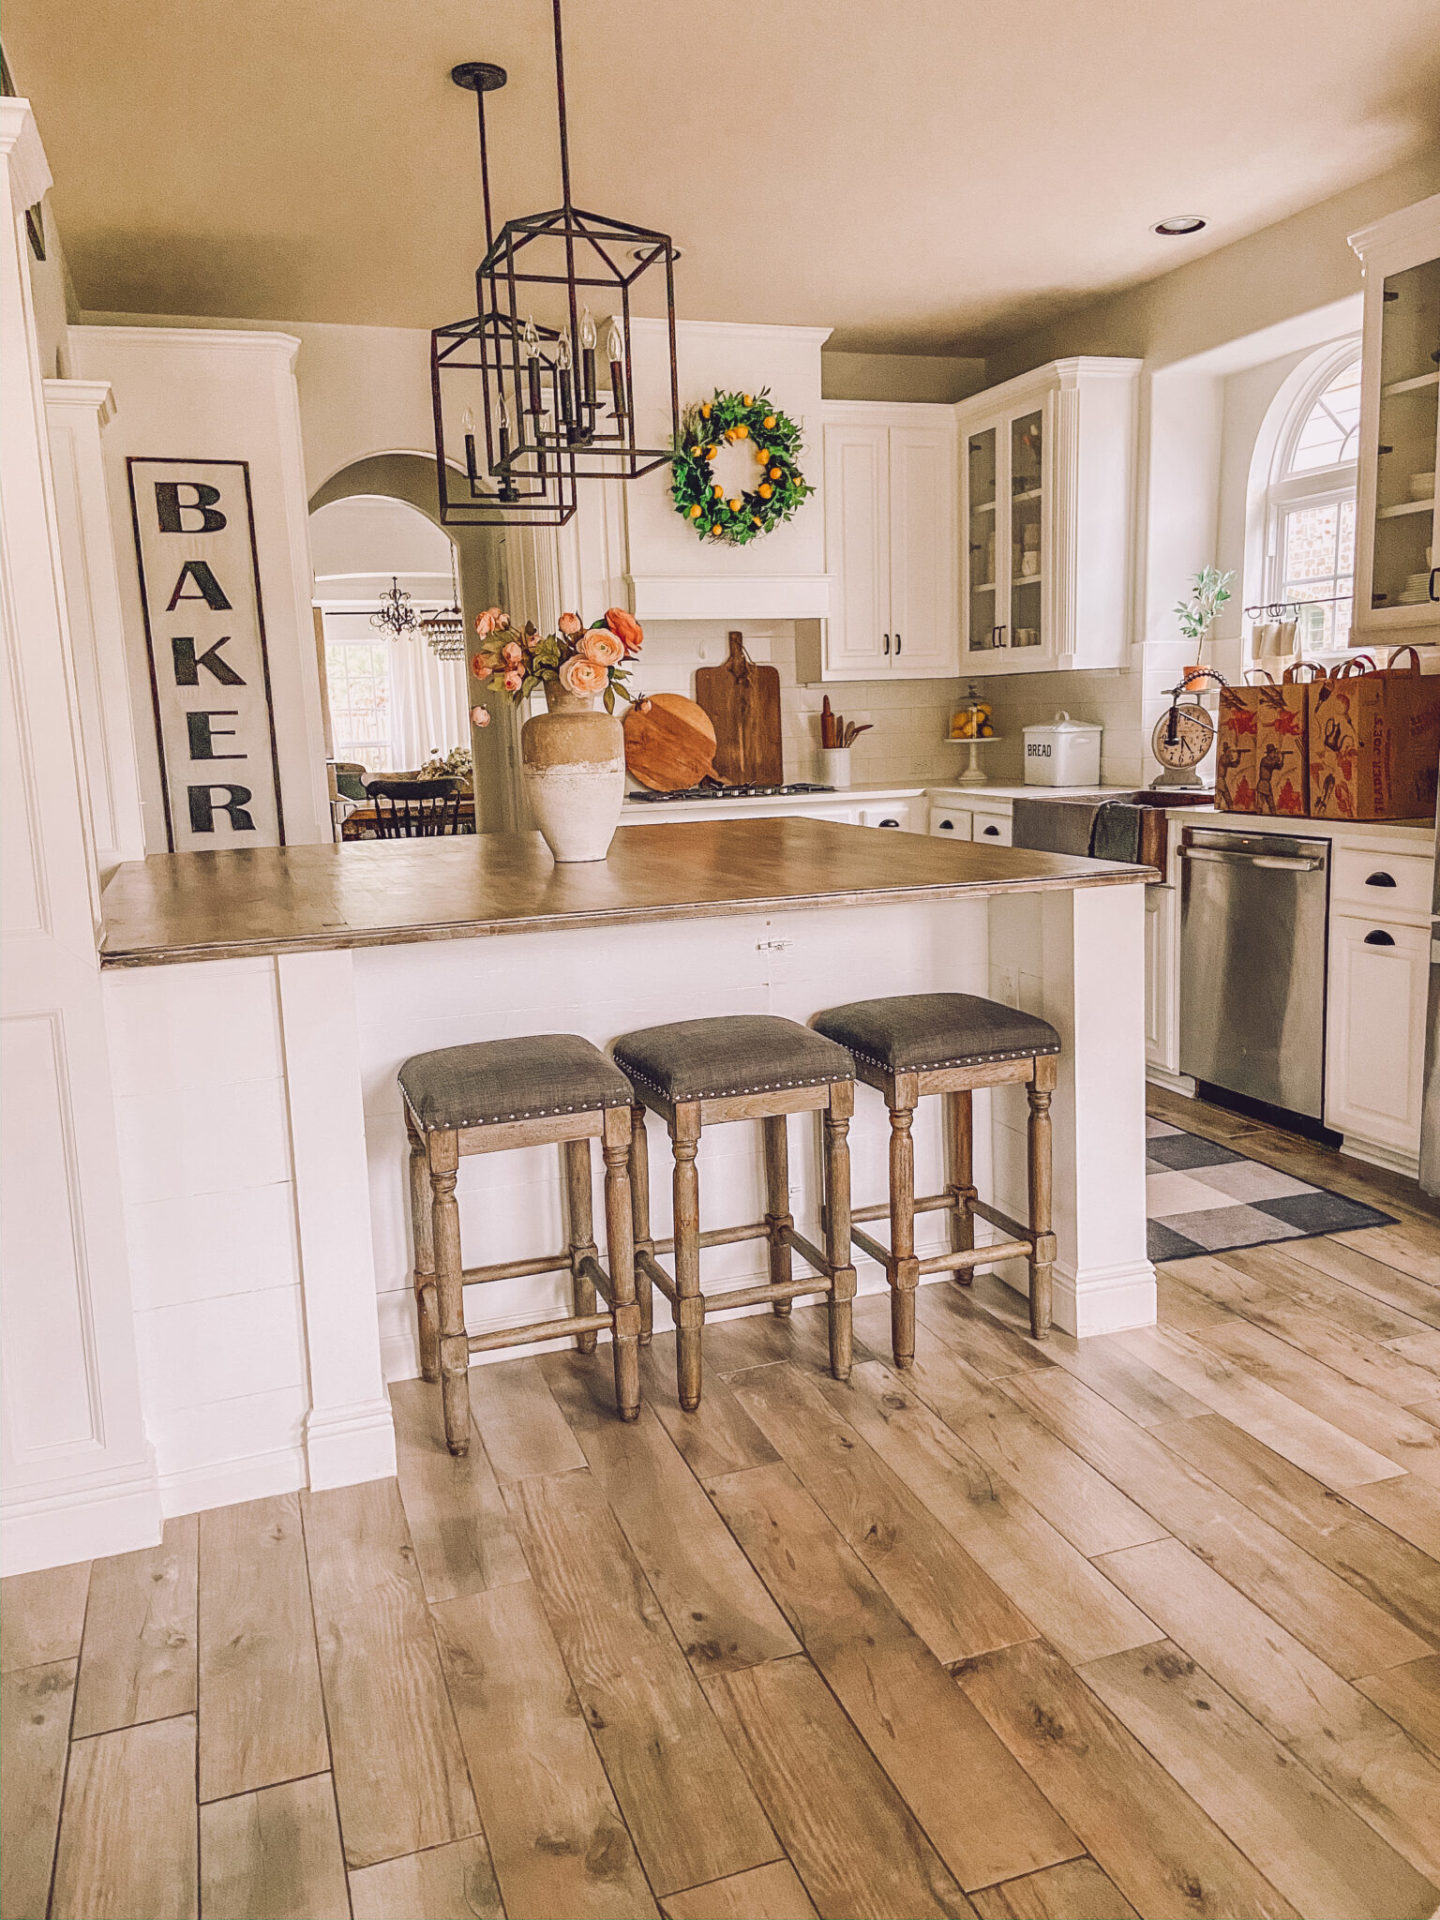 Builder Grade Kitchen Updates by sheholdsdearly.com